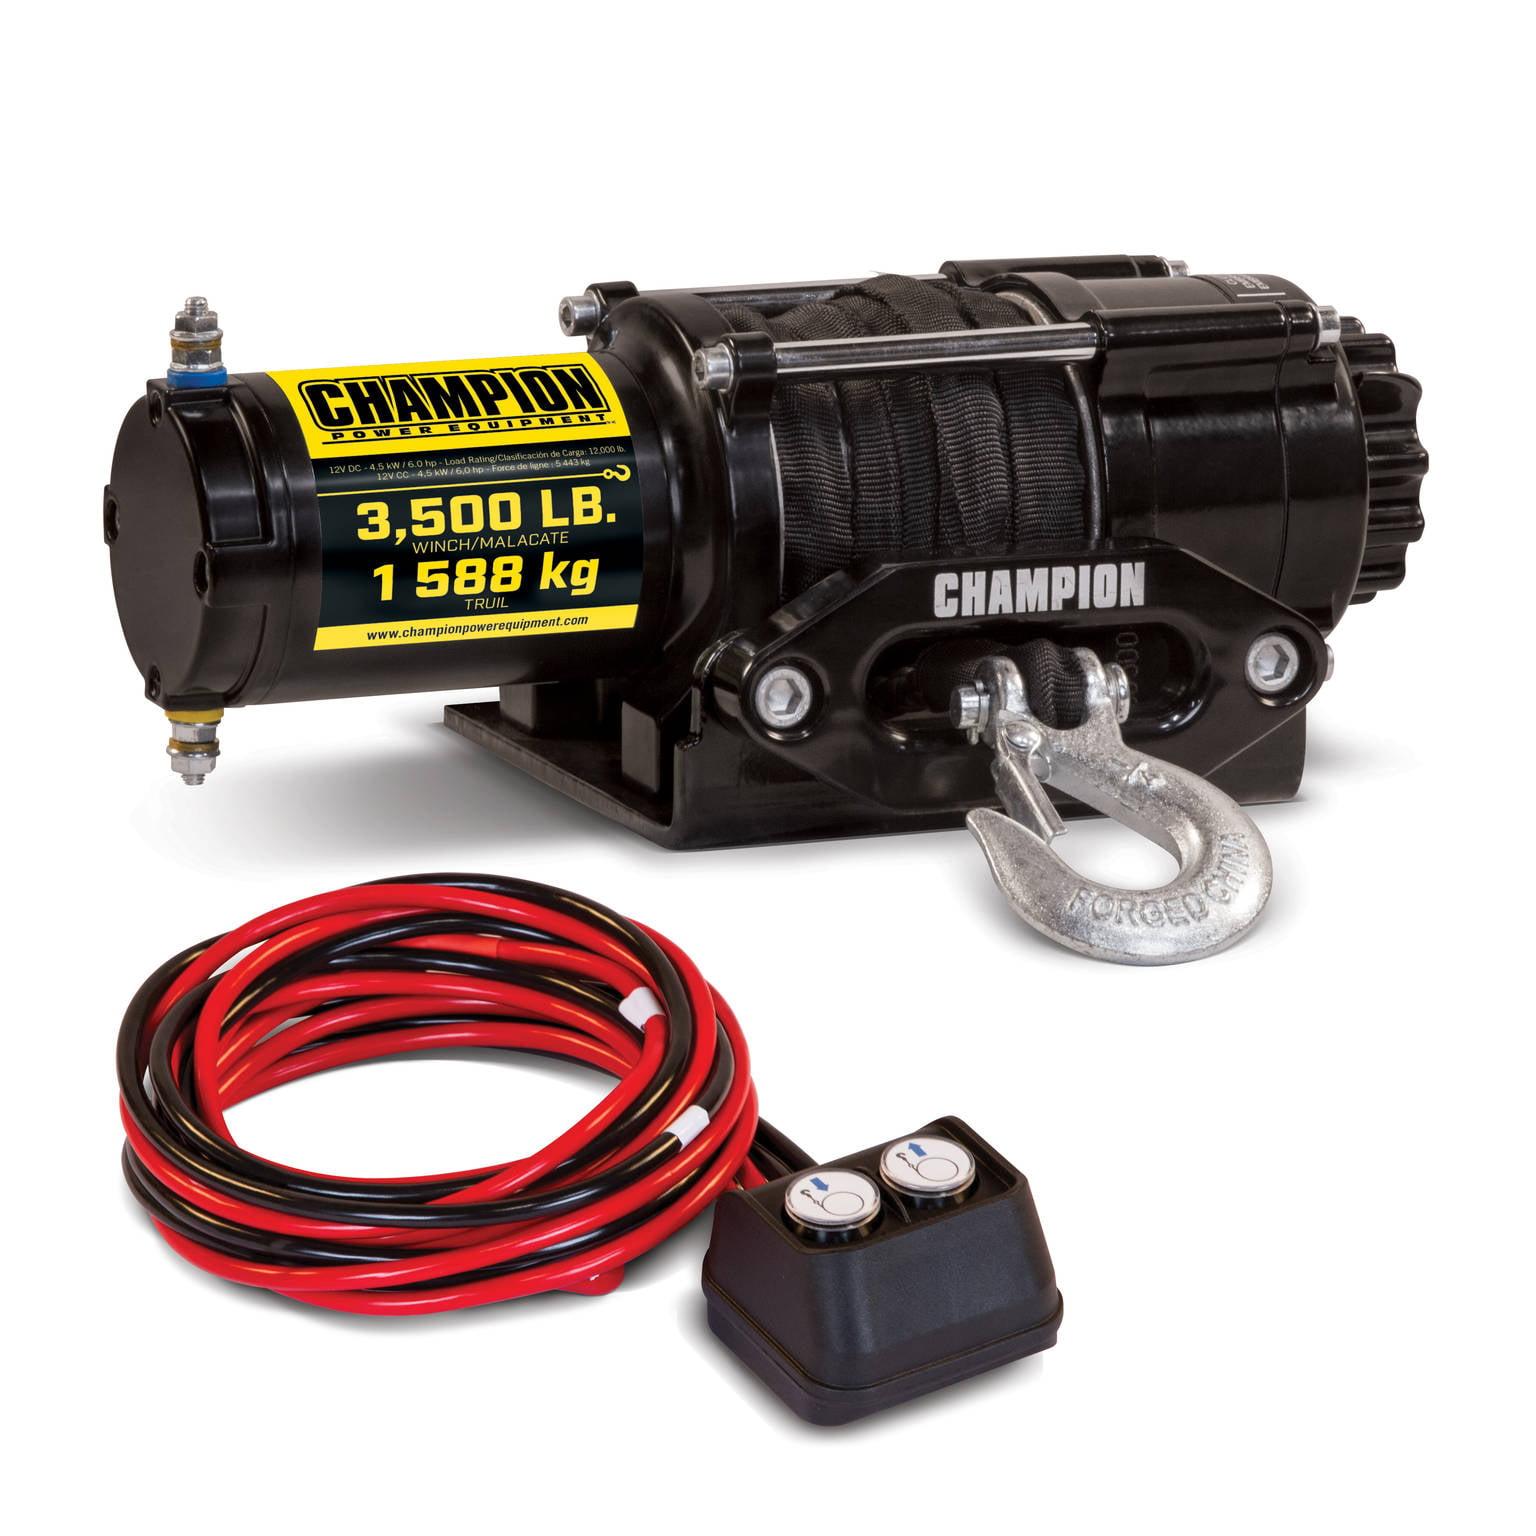 Champion 100428 3500-lb. ATV/UTV Synthetic Rope Winch Kit